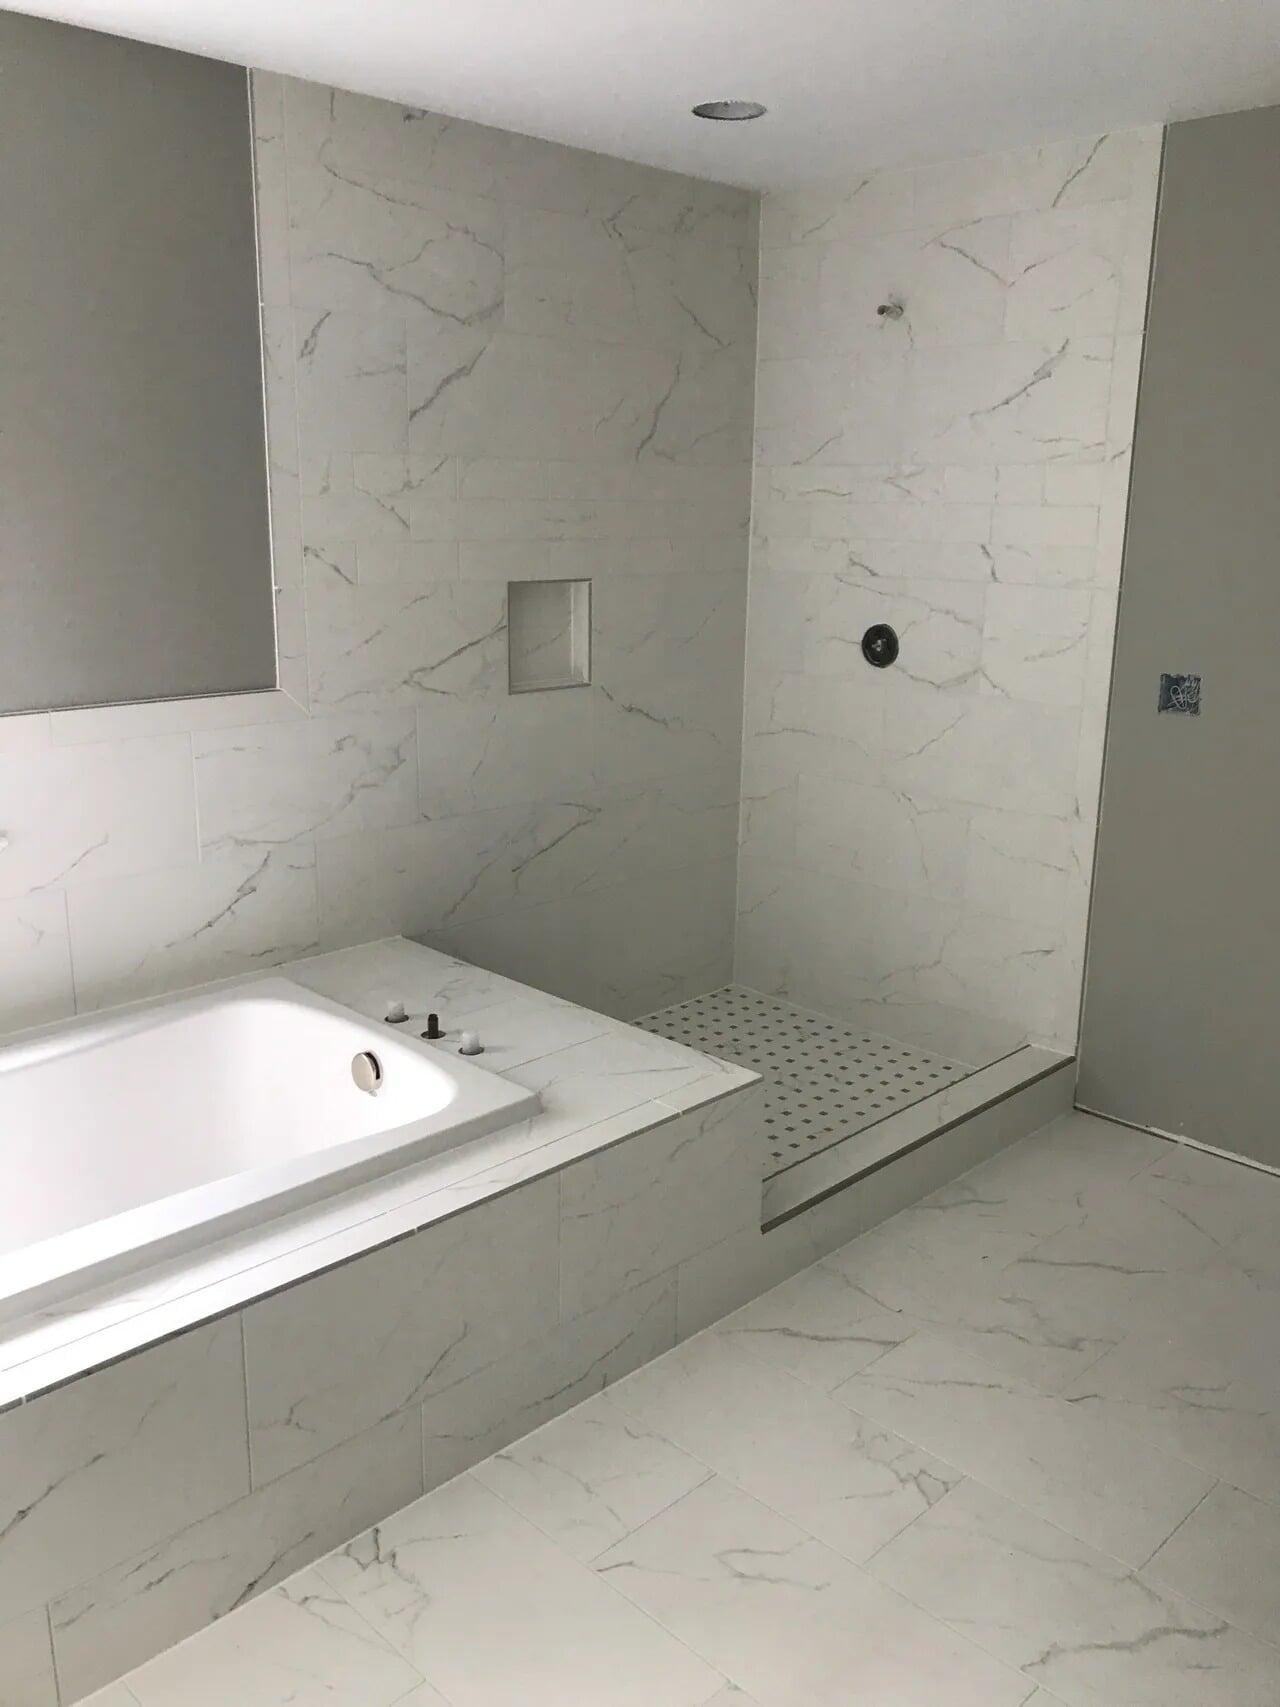 Bathroom tiles in York, PA from Chuck Kraft Carpets